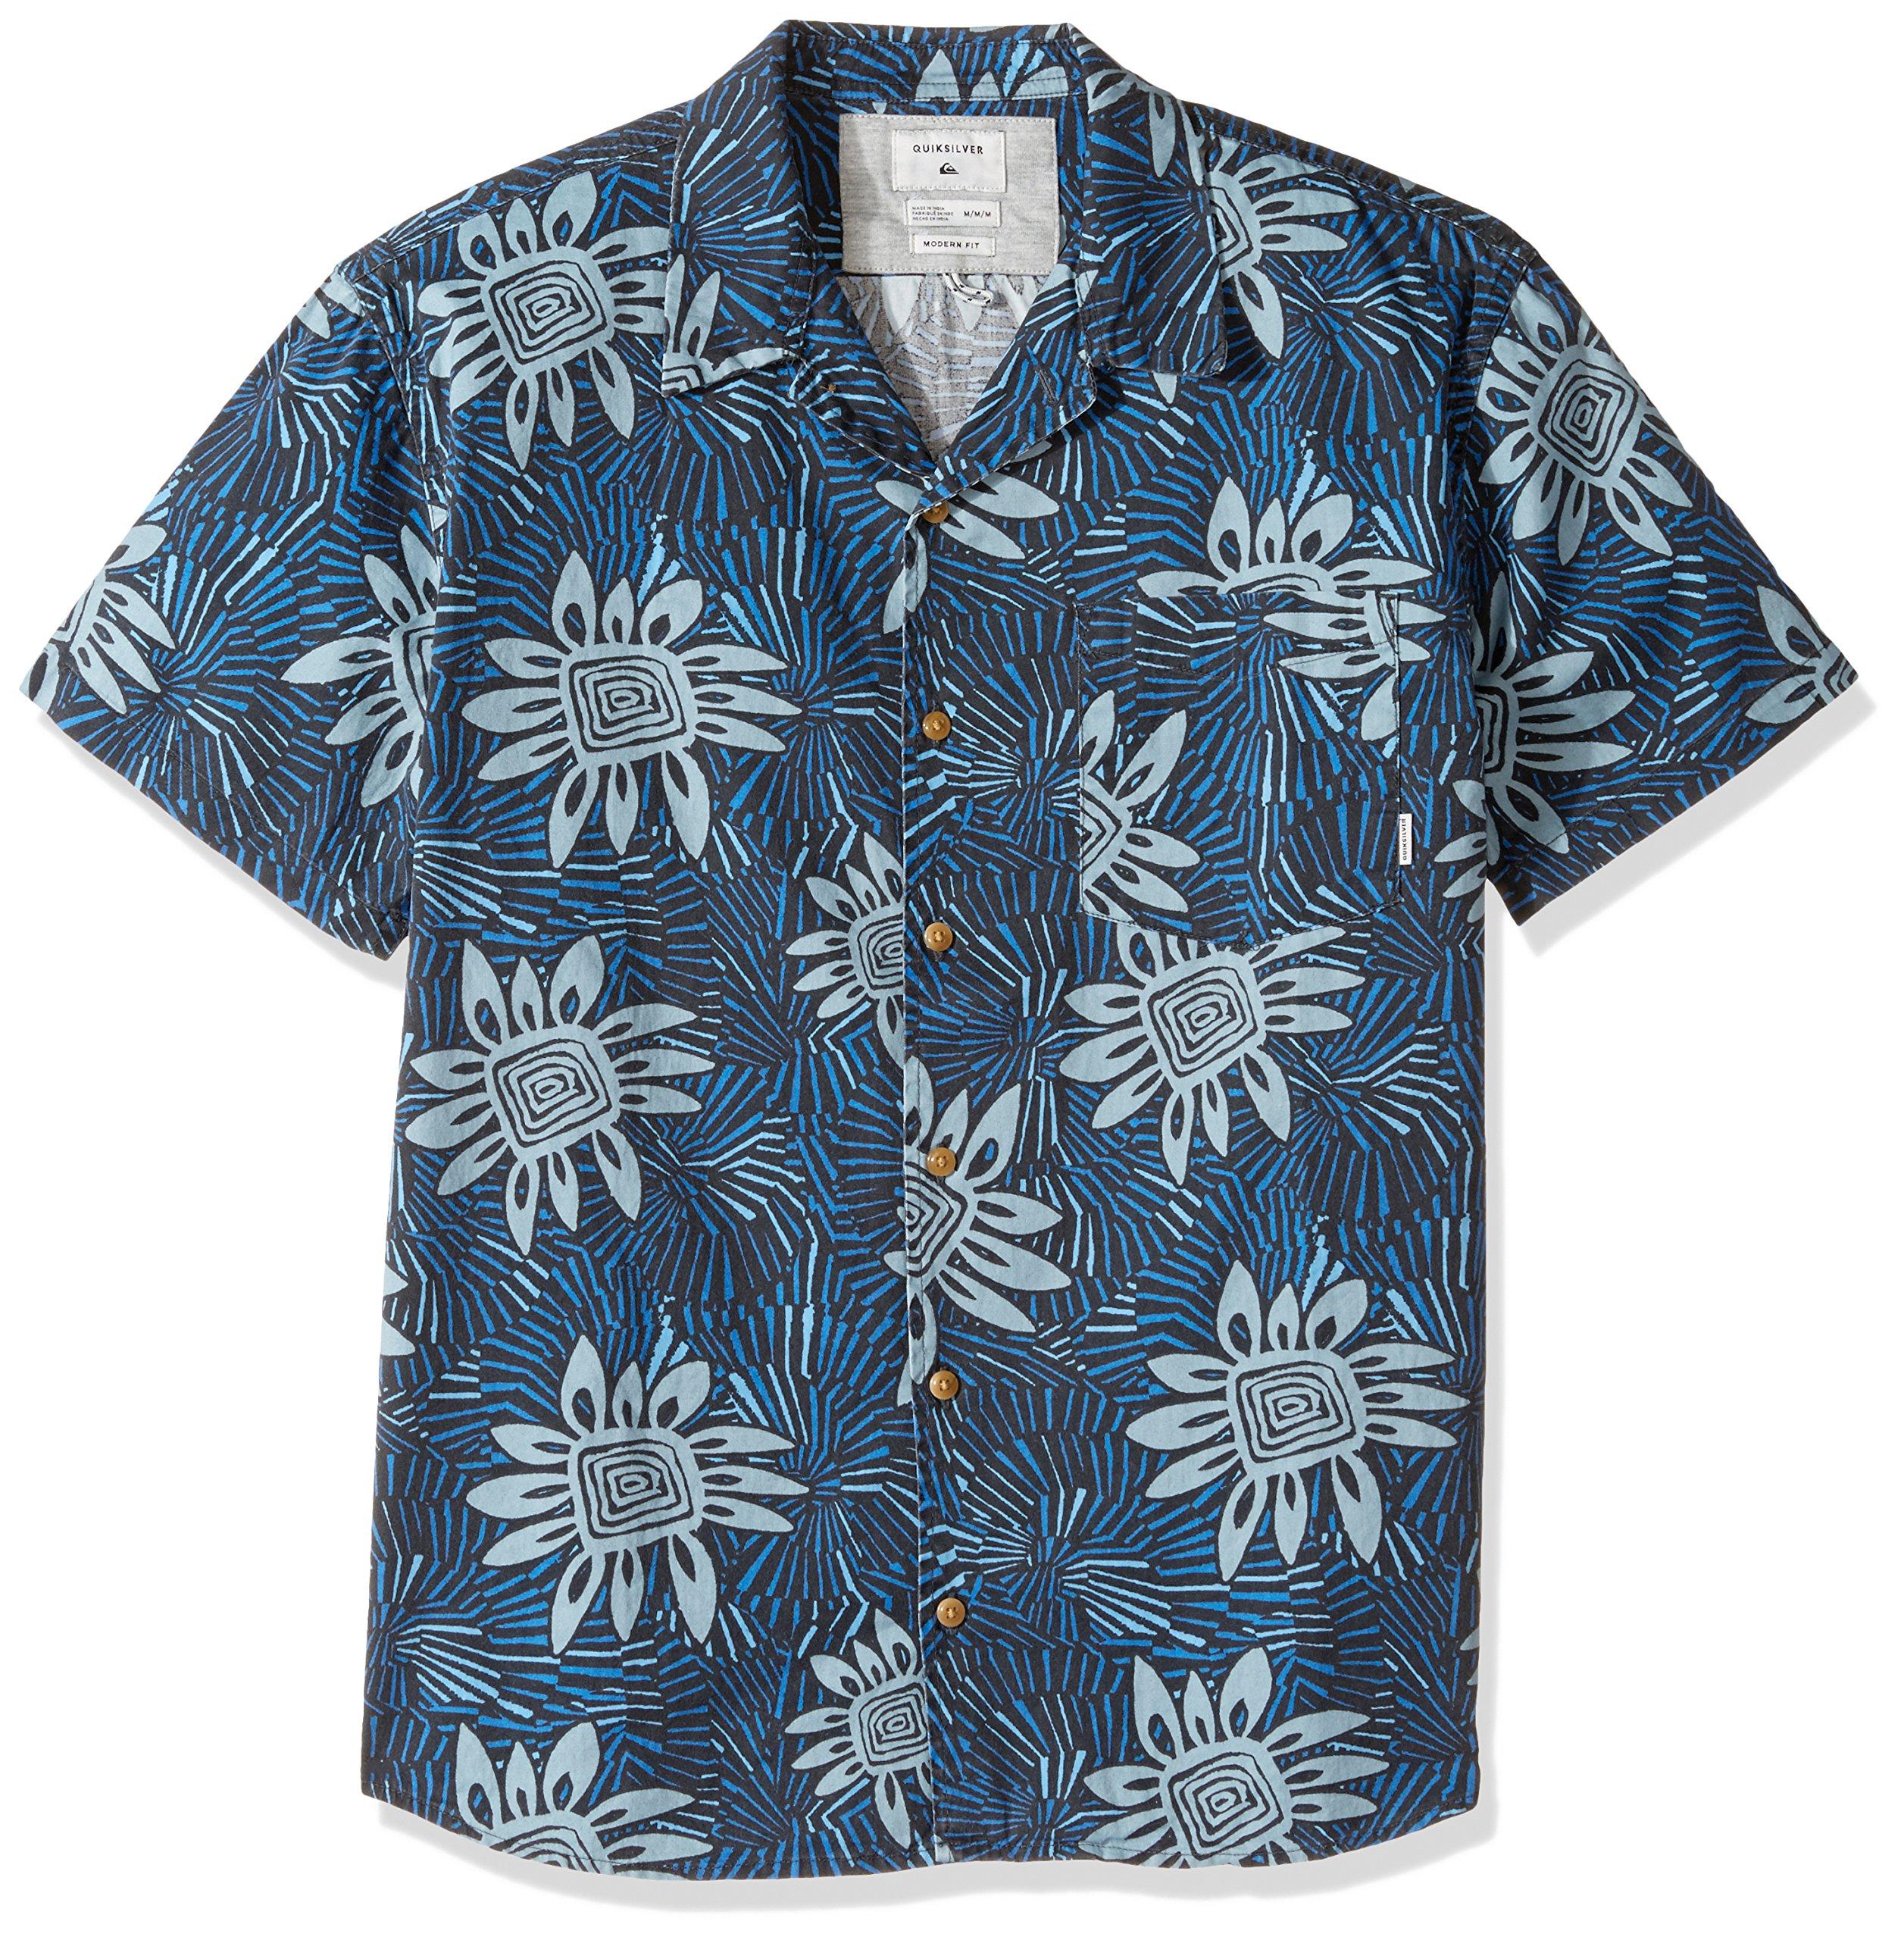 Quiksilver Men's Indian Summer Button Down Shirt, Stone Blue Indian Summer, Large